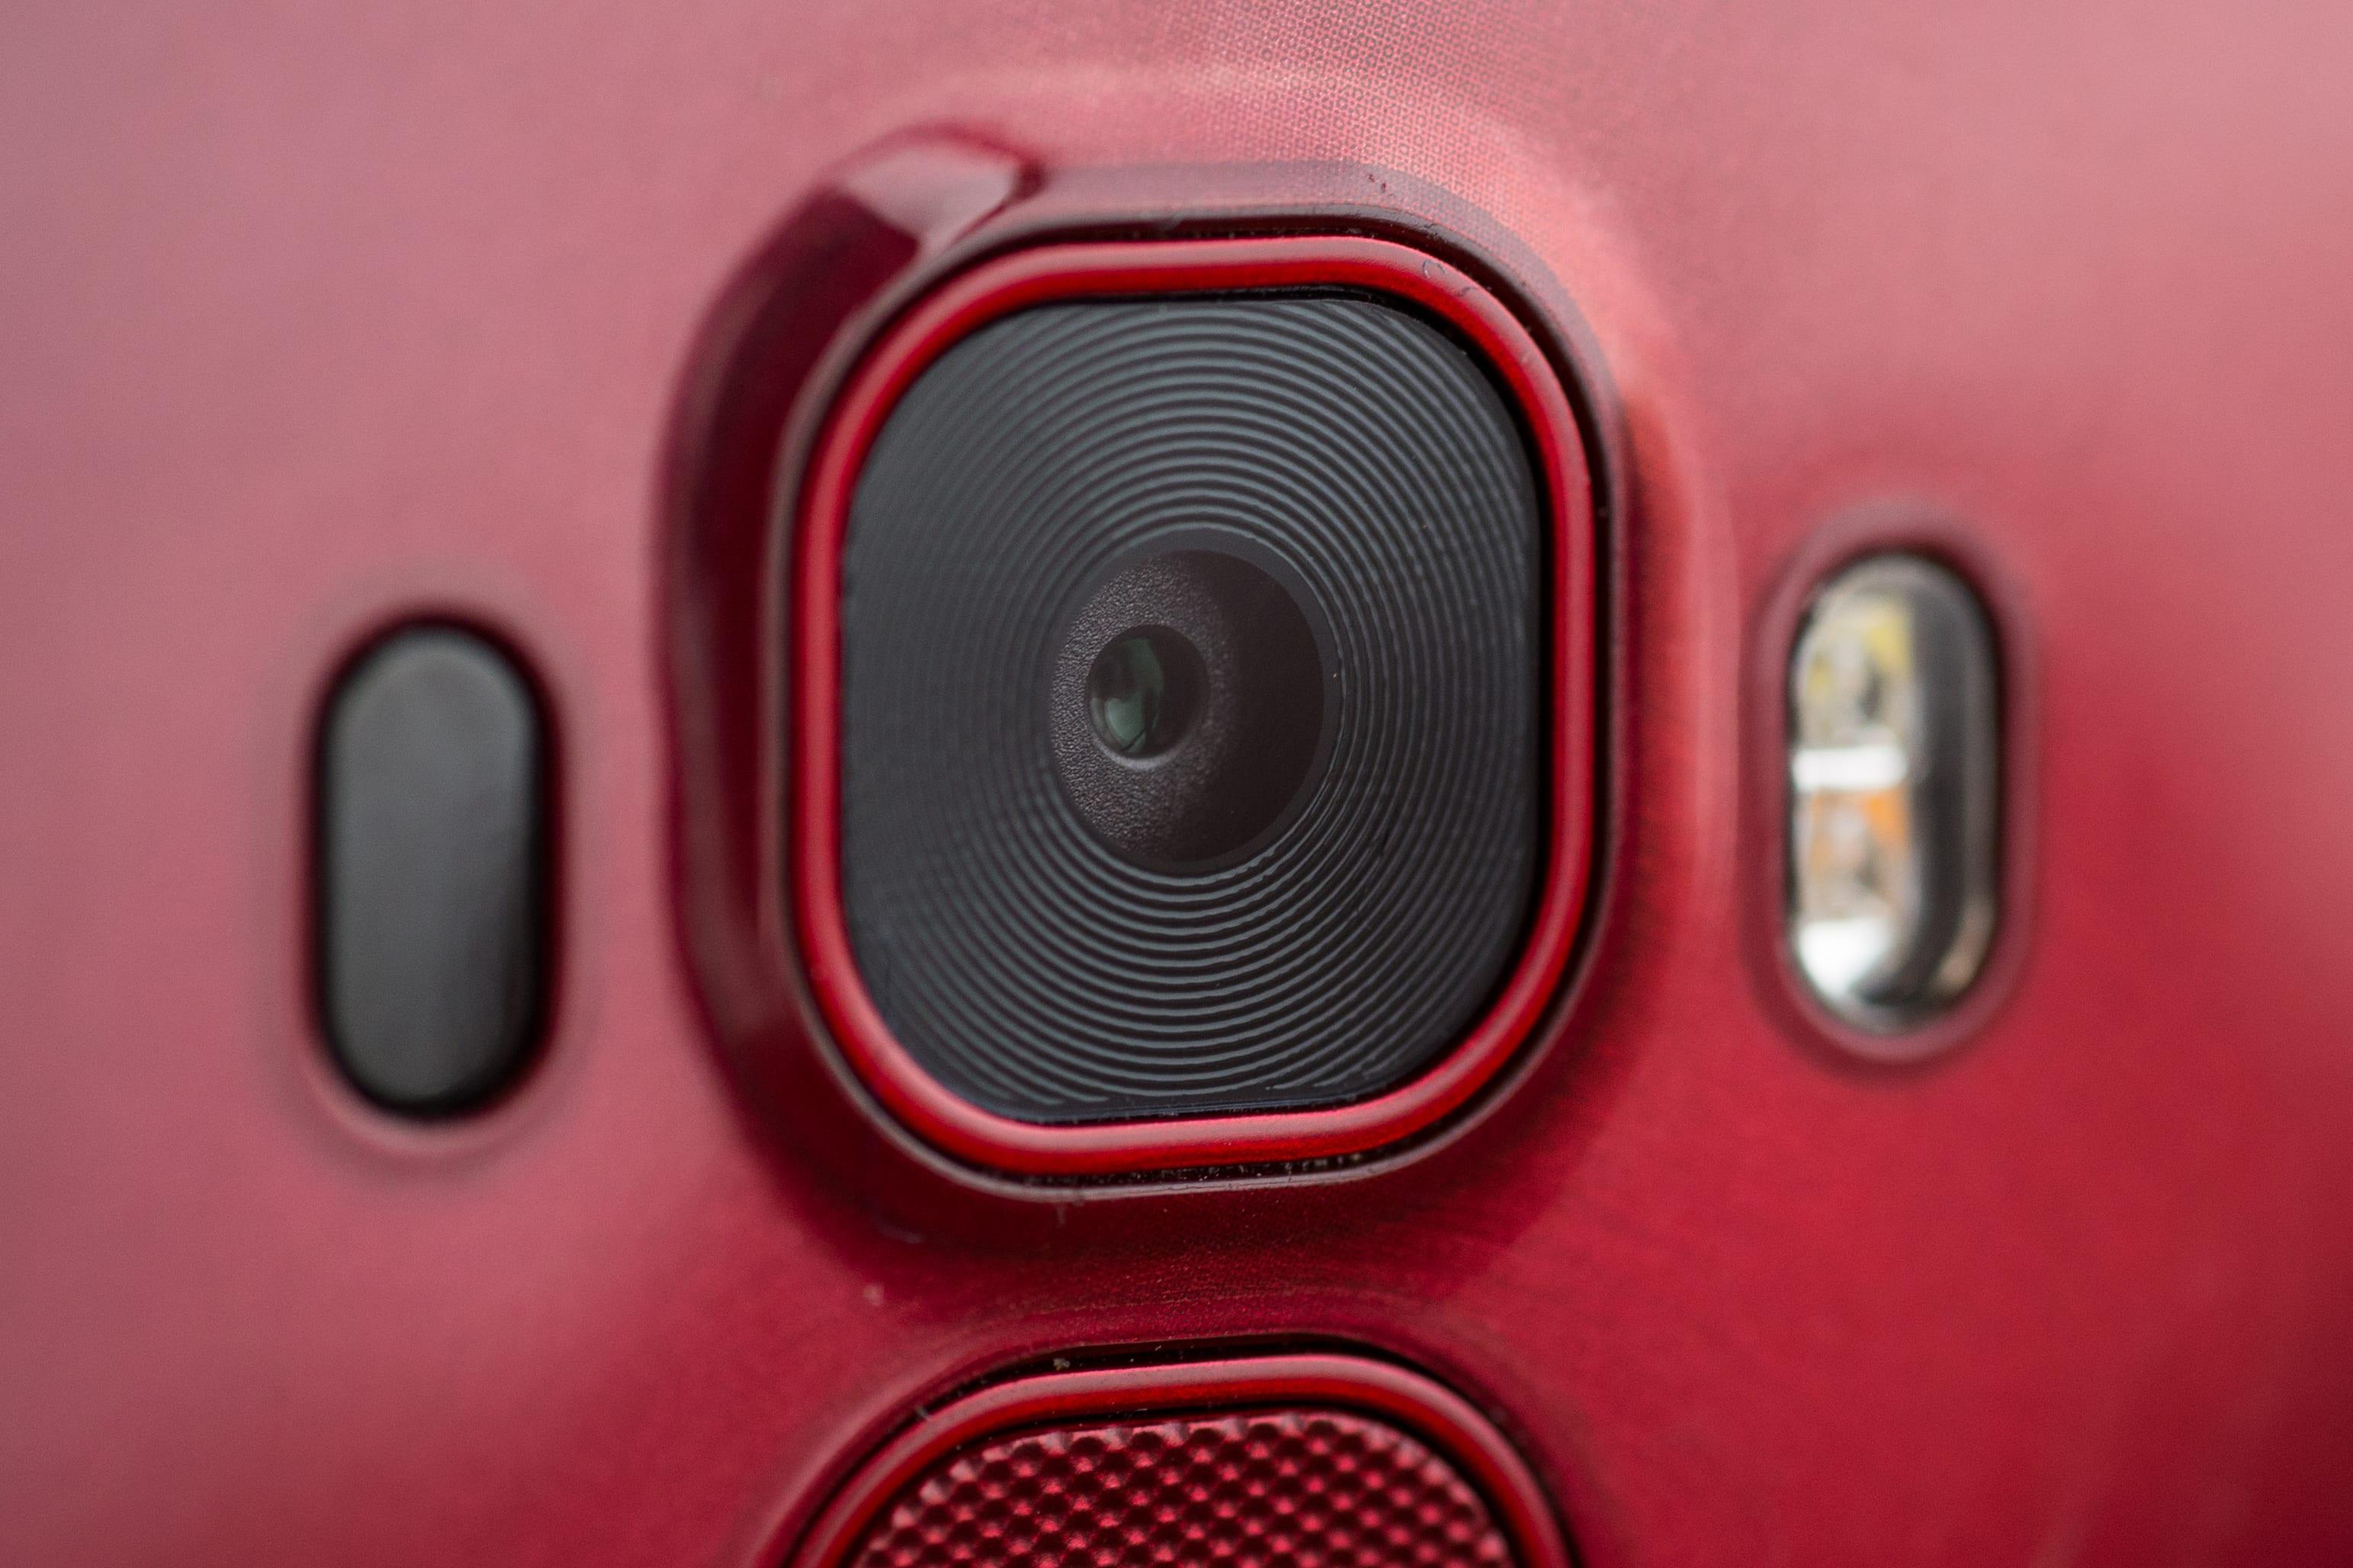 A photograph of the LG G Flex 2's camera.